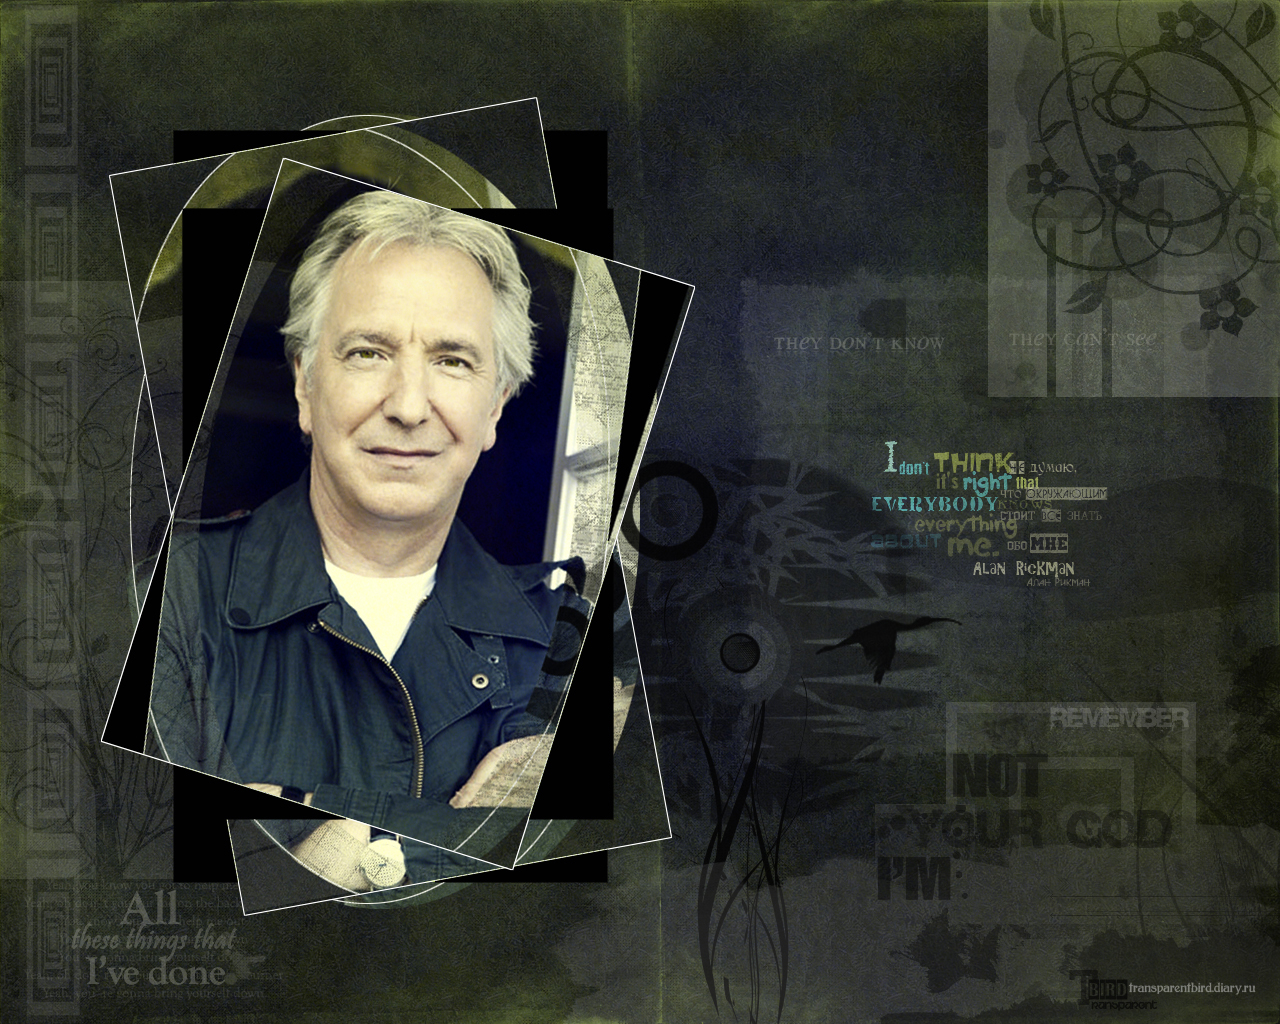 Alan Rickman - wallpaper 3-1 by transparentbird